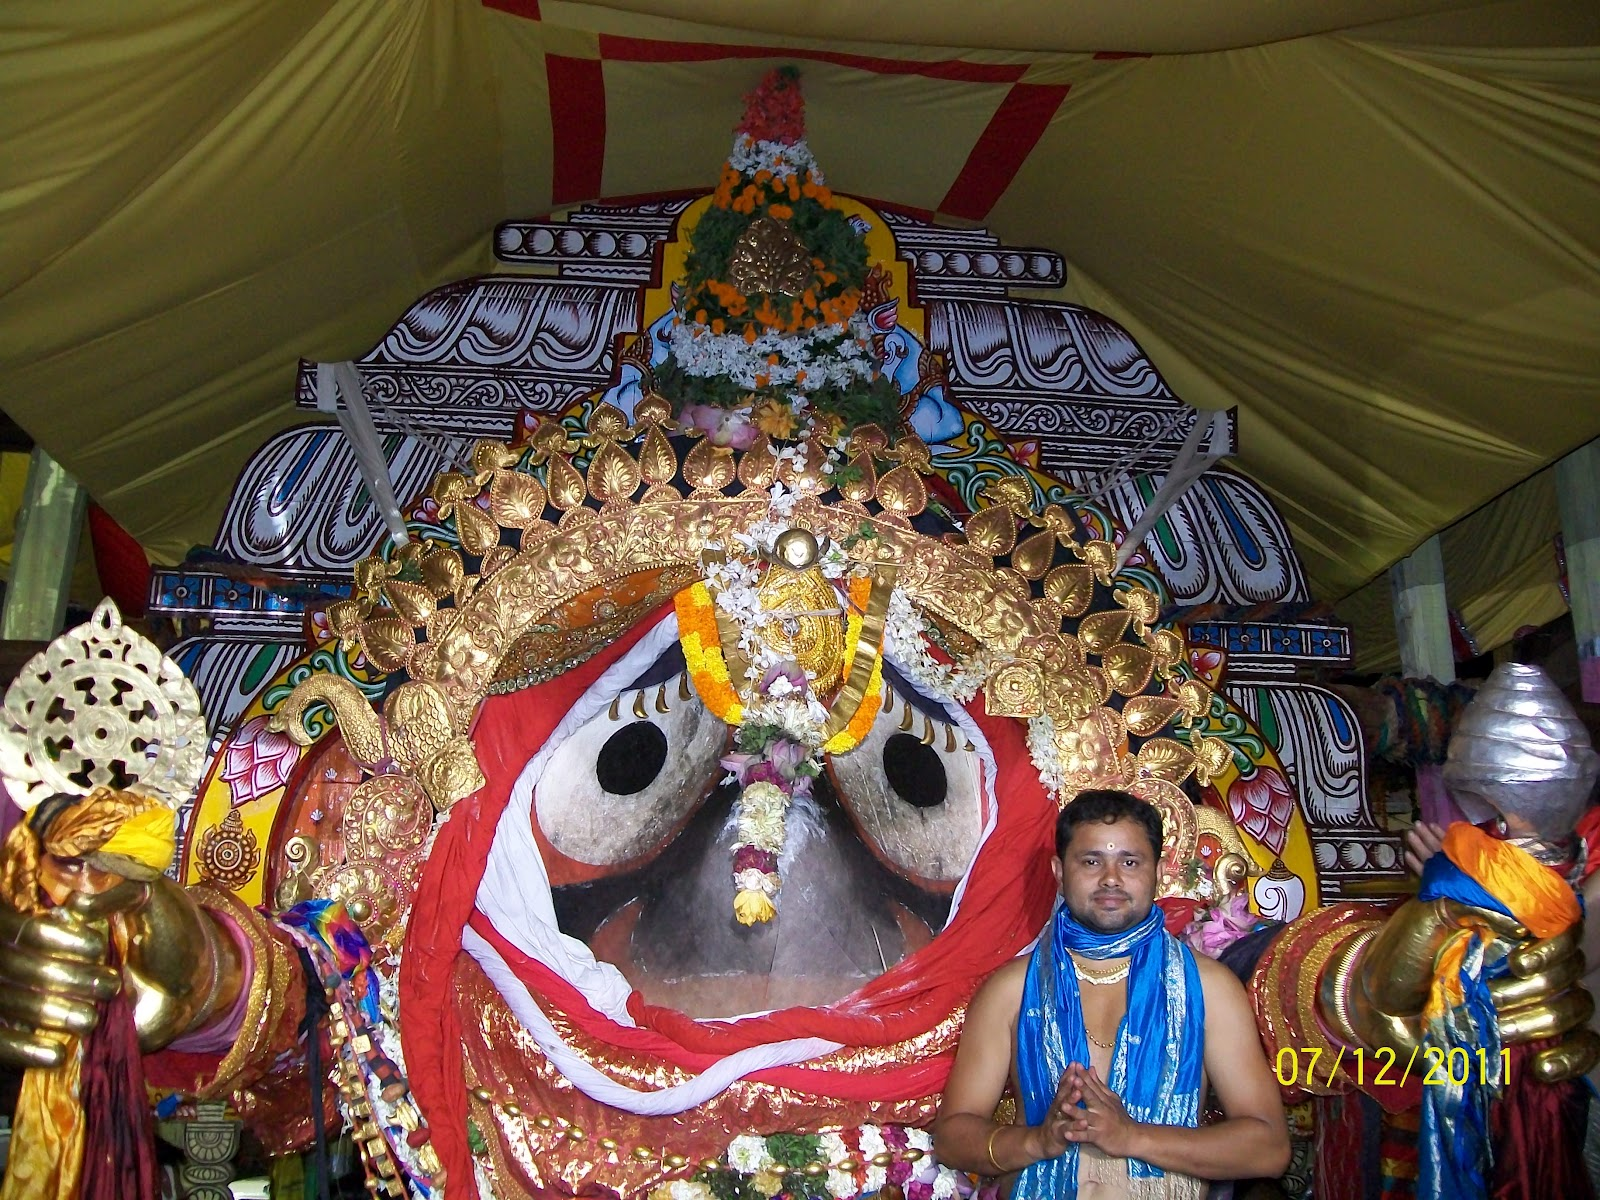 Simple Wallpaper Lord Jagannath Puri - 2  You Should Have_713621.jpg